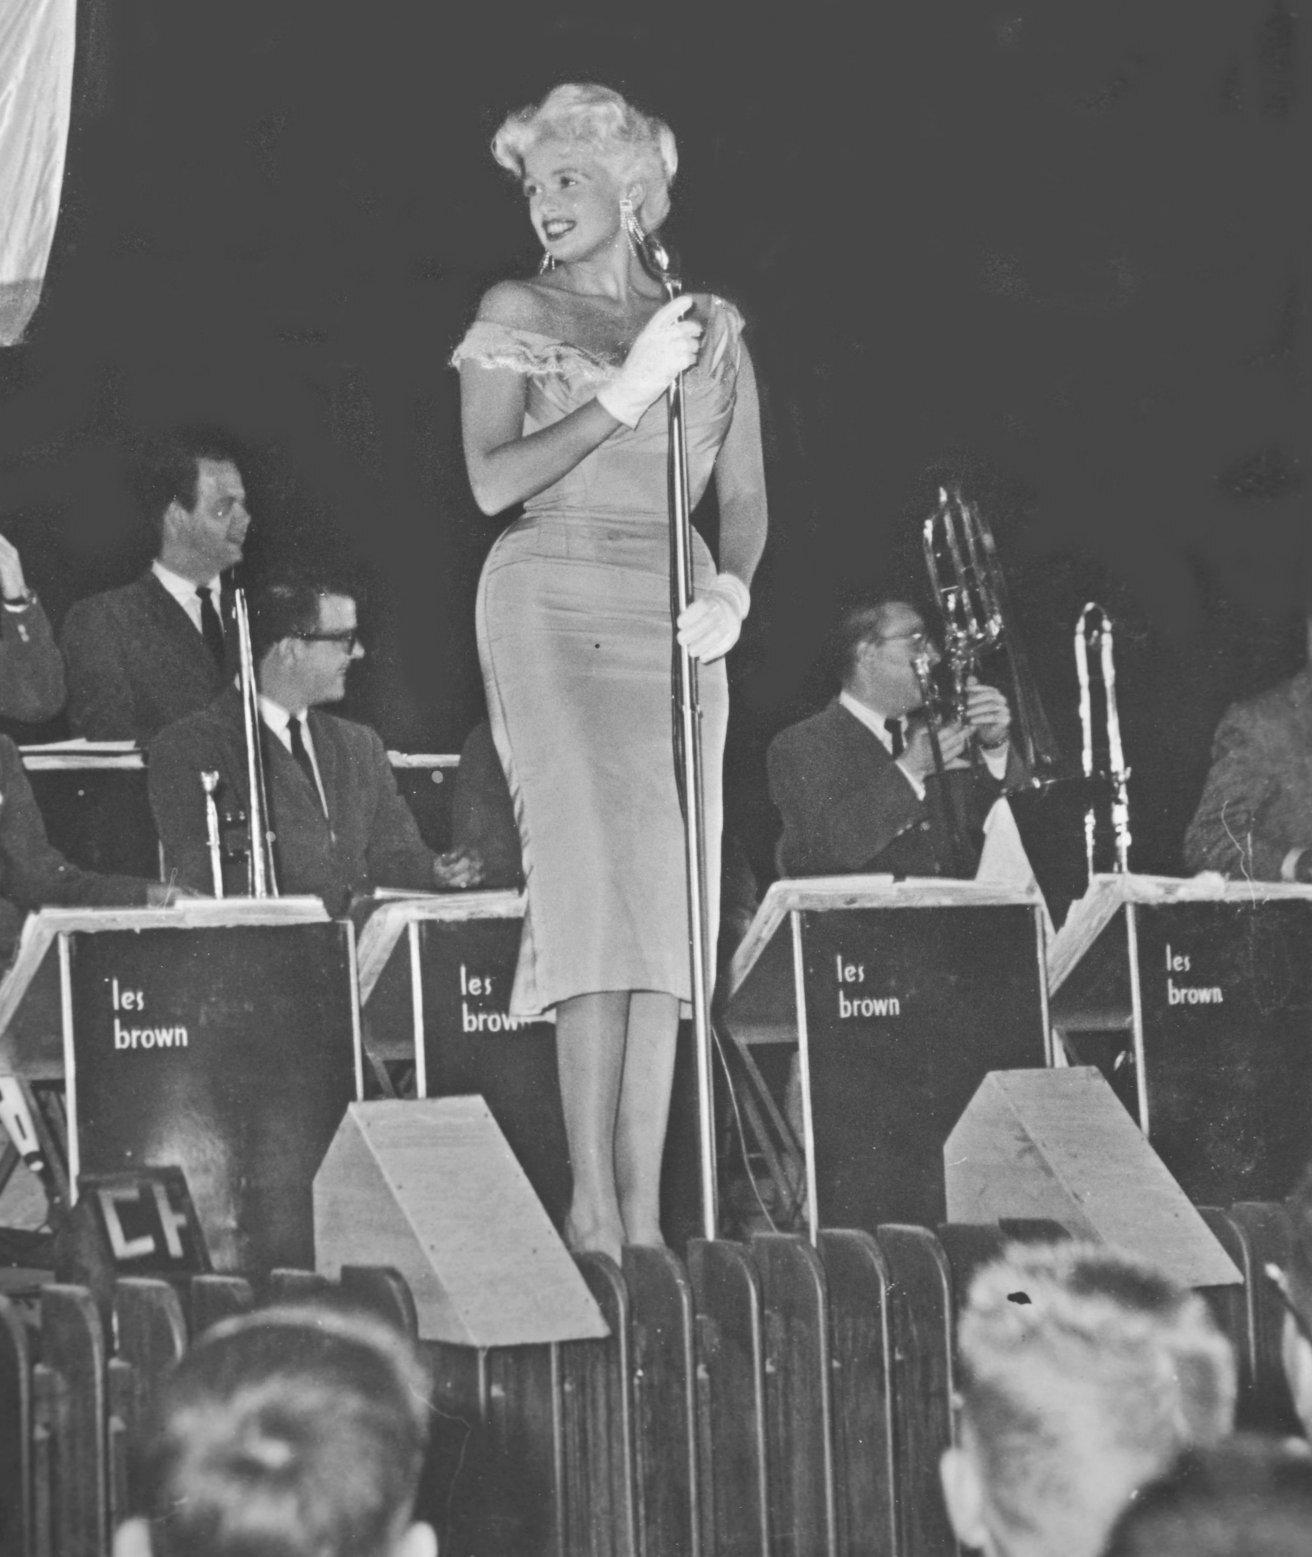 jayne-1957-12-USO_tour-korea-stage-1